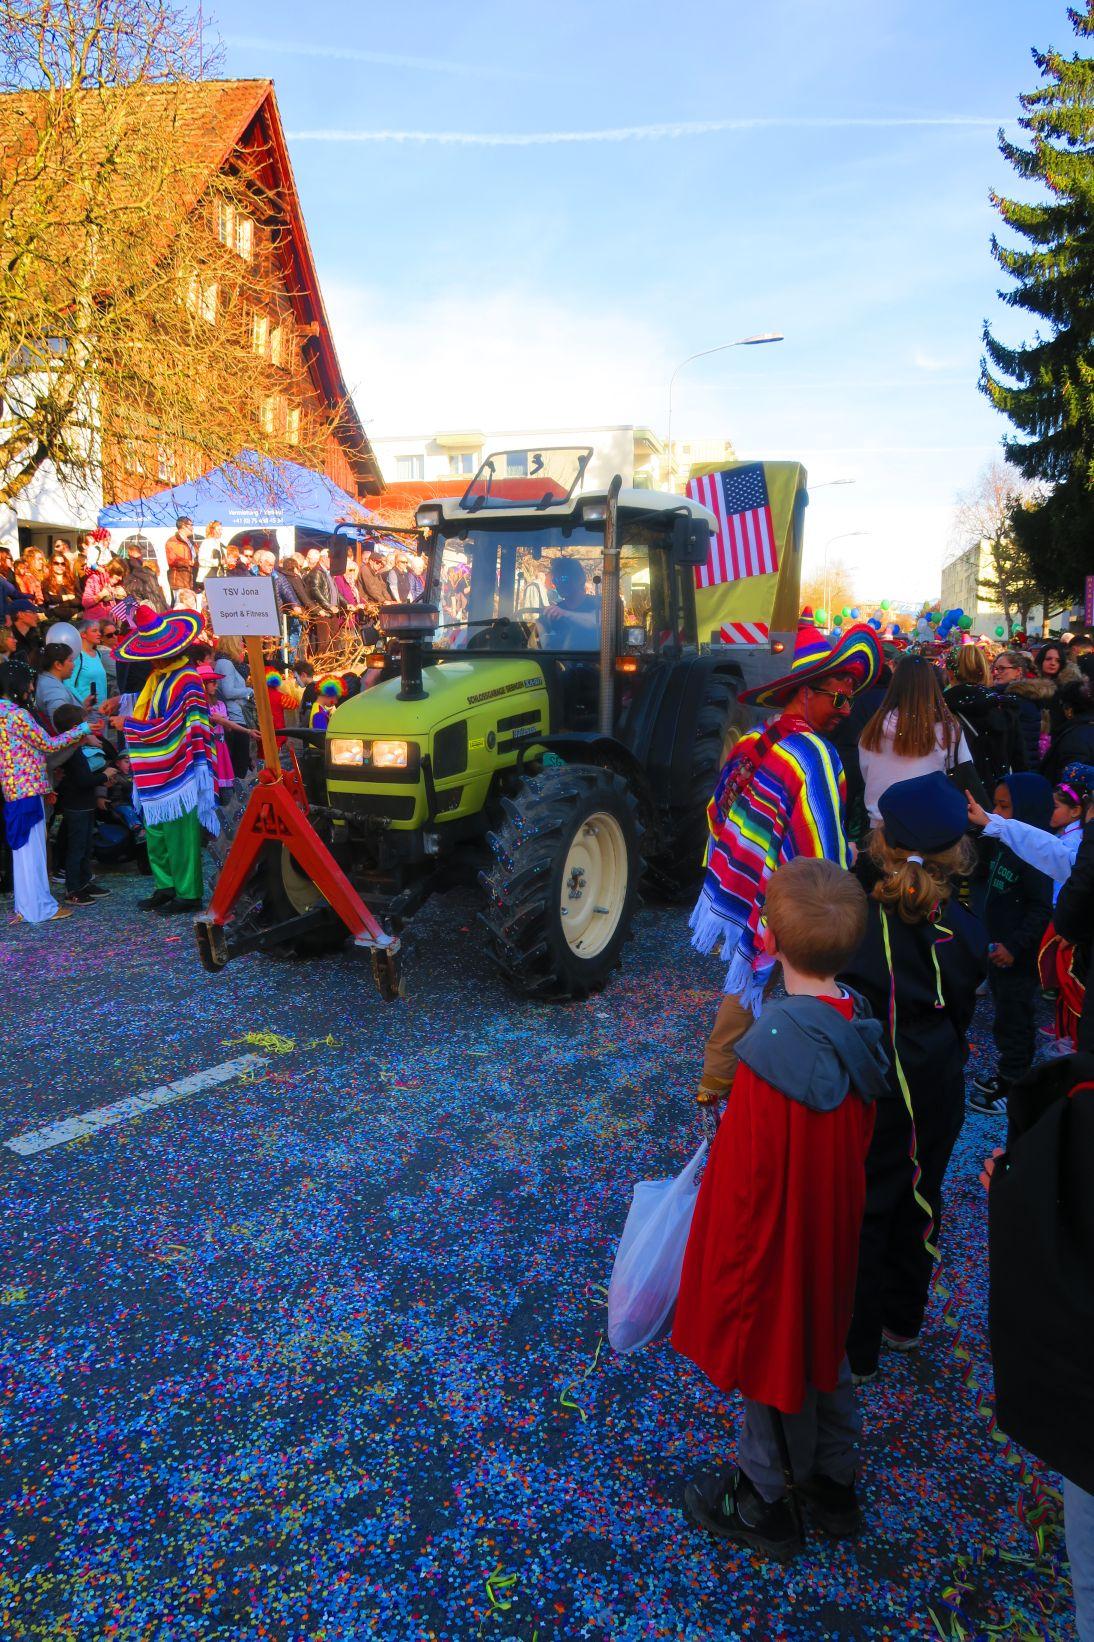 TSVJ-SF-2017-02-23-Fasnacht-Mexikaner-IMG-CE-0130